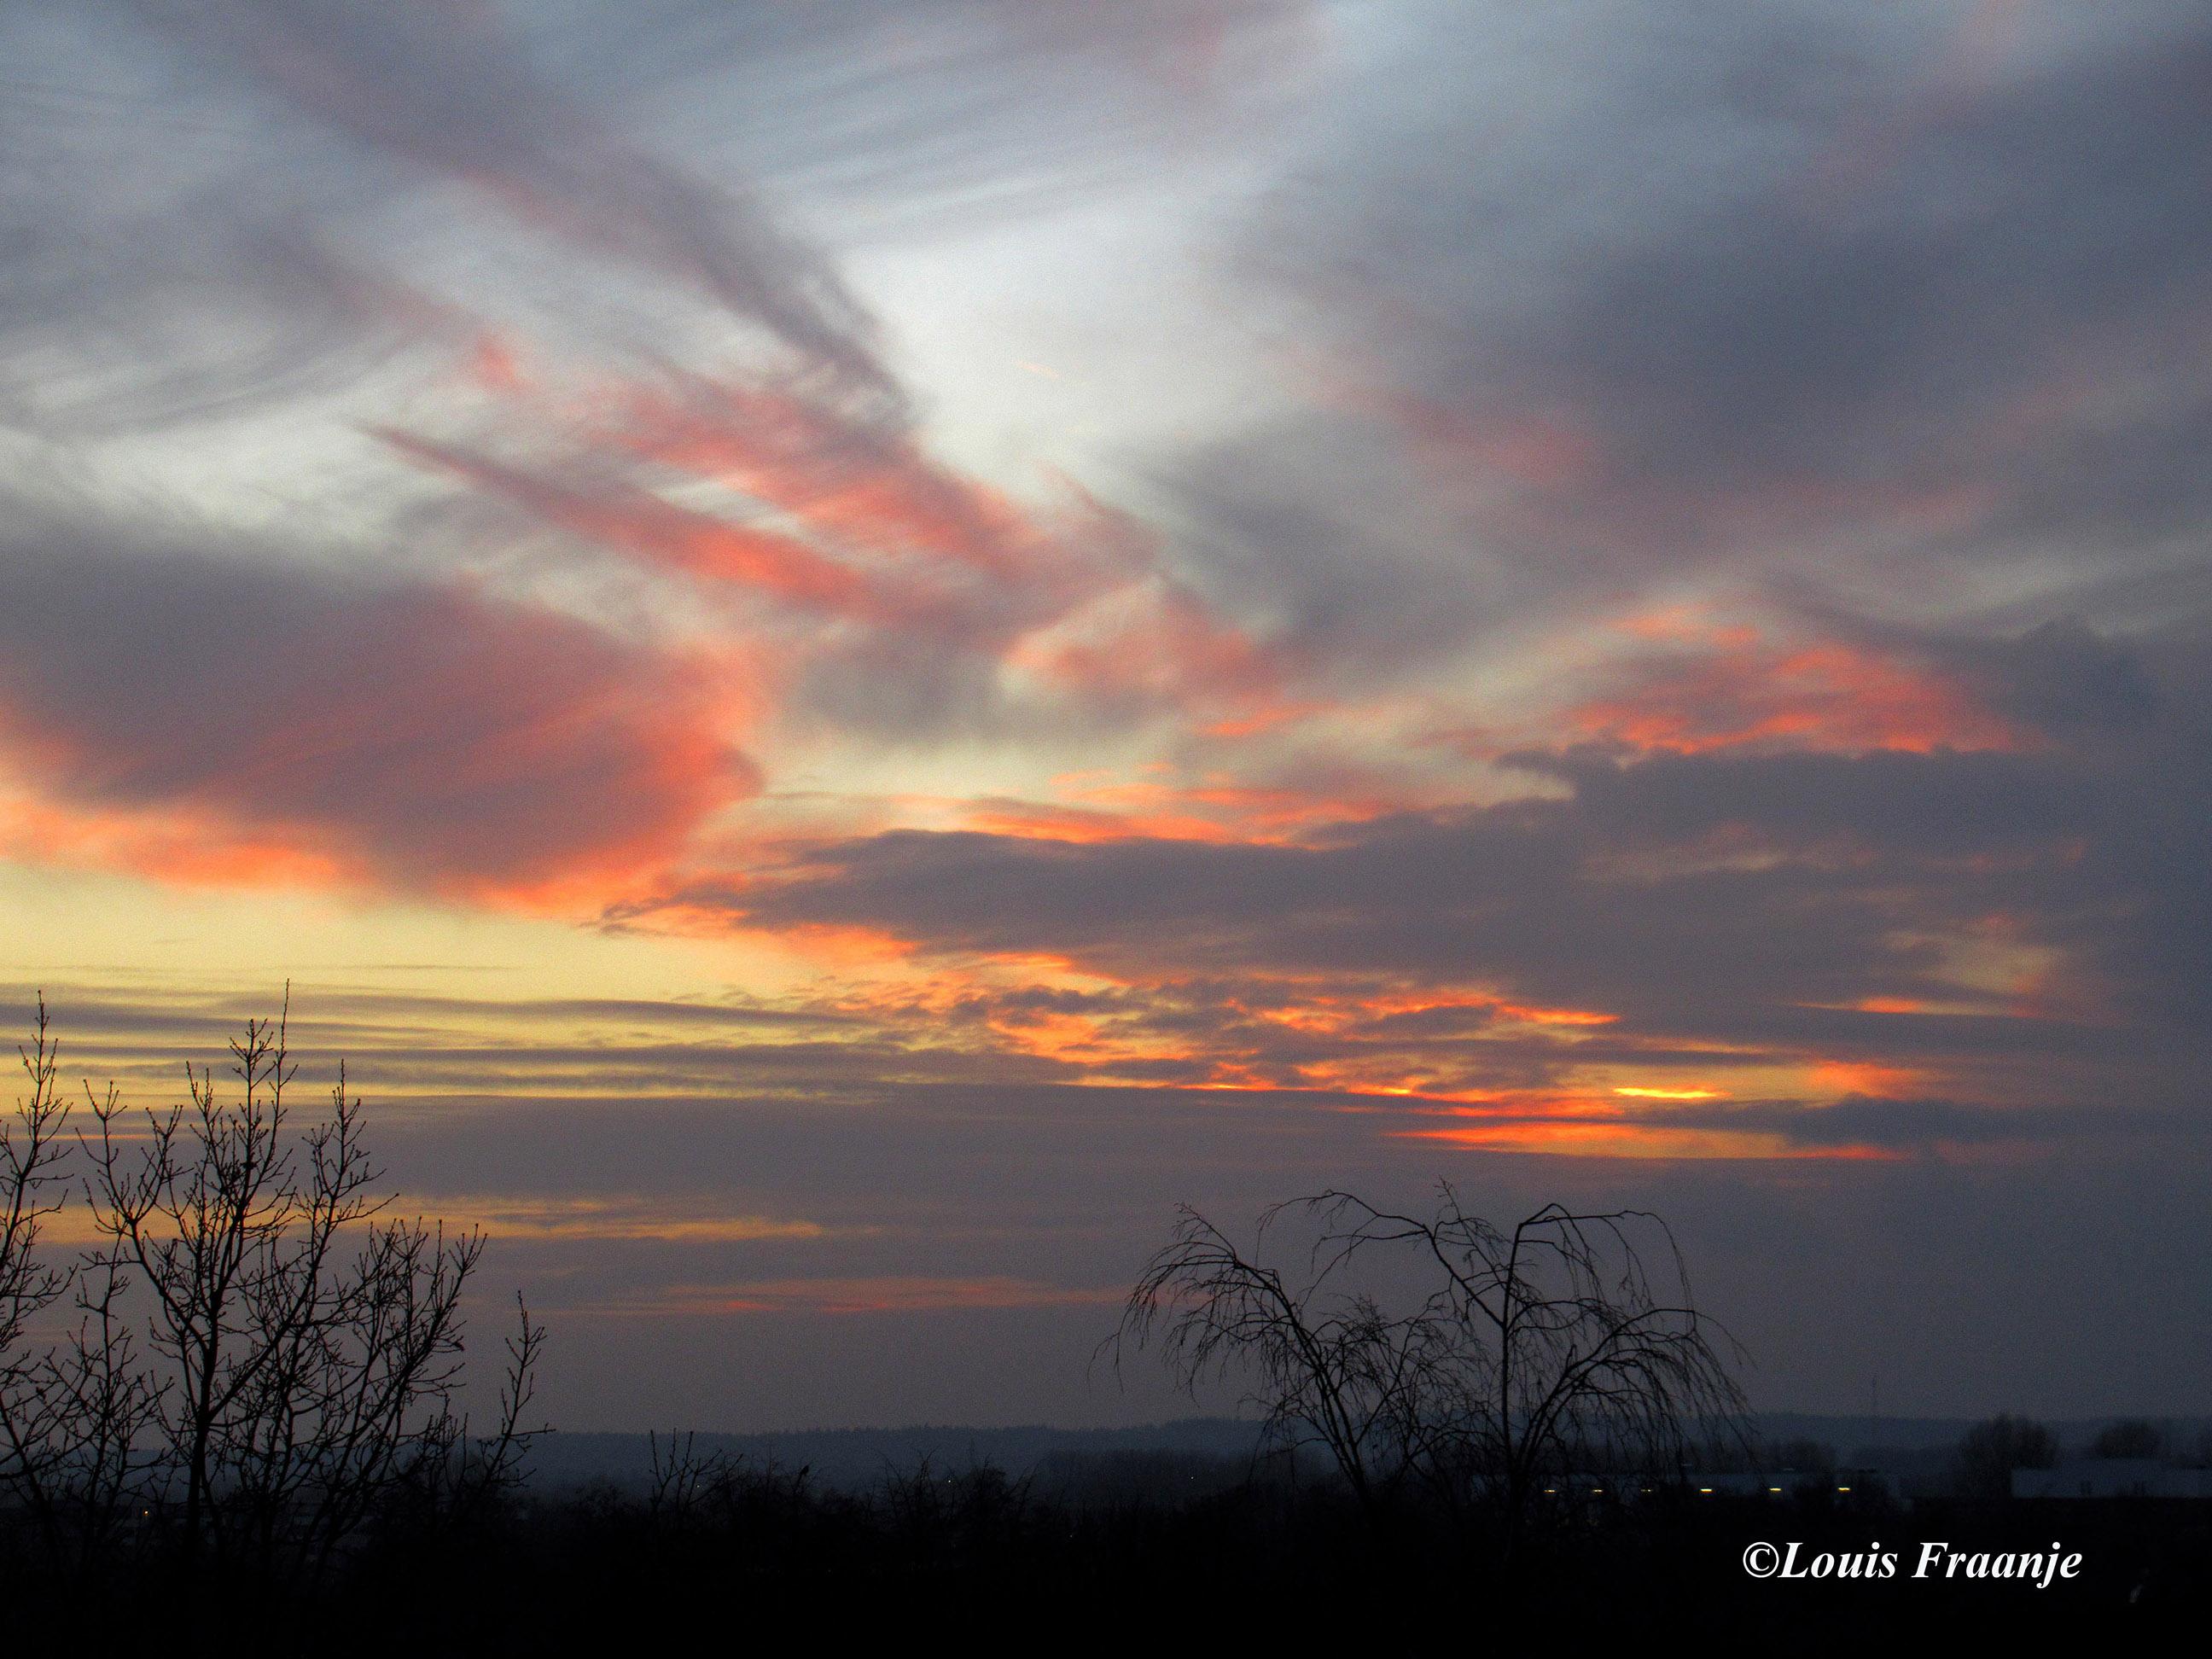 Prachtige avondhemel om 17.35 uur boven de Grebbeberg bij Rhenen - Foto: ©Louis Fraanje